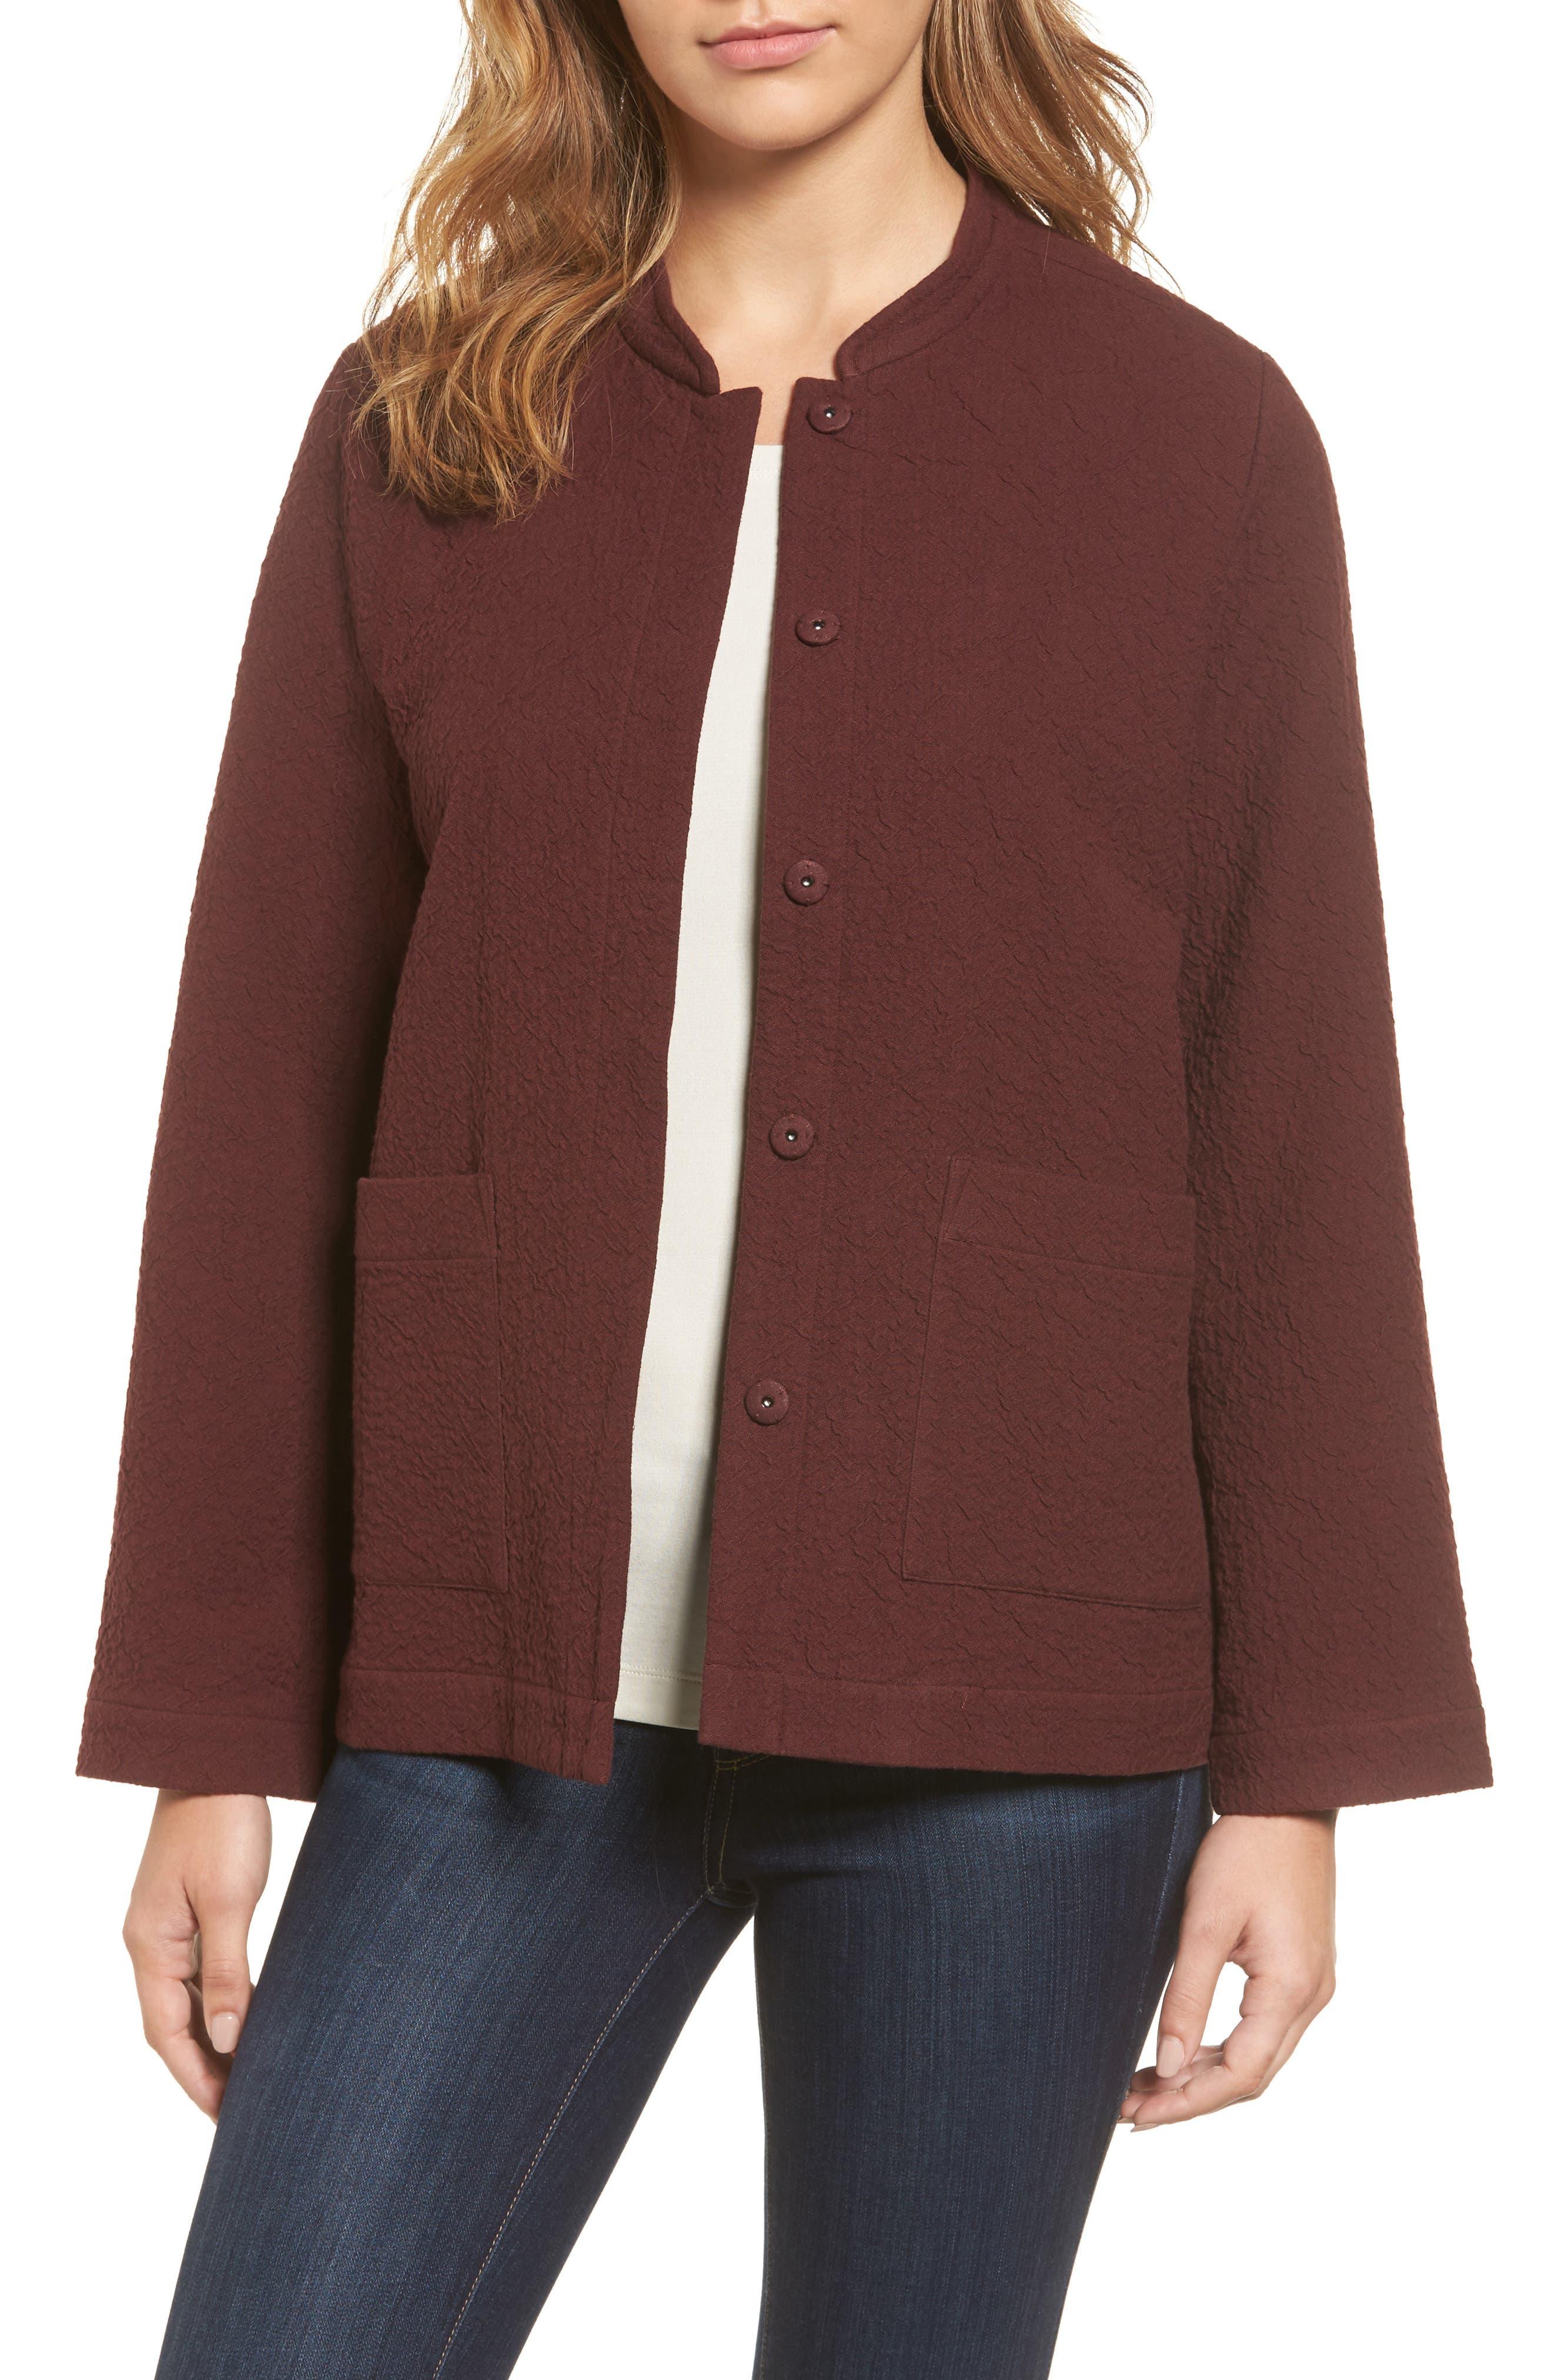 Organic Cotton Jacket,                             Main thumbnail 1, color,                             623